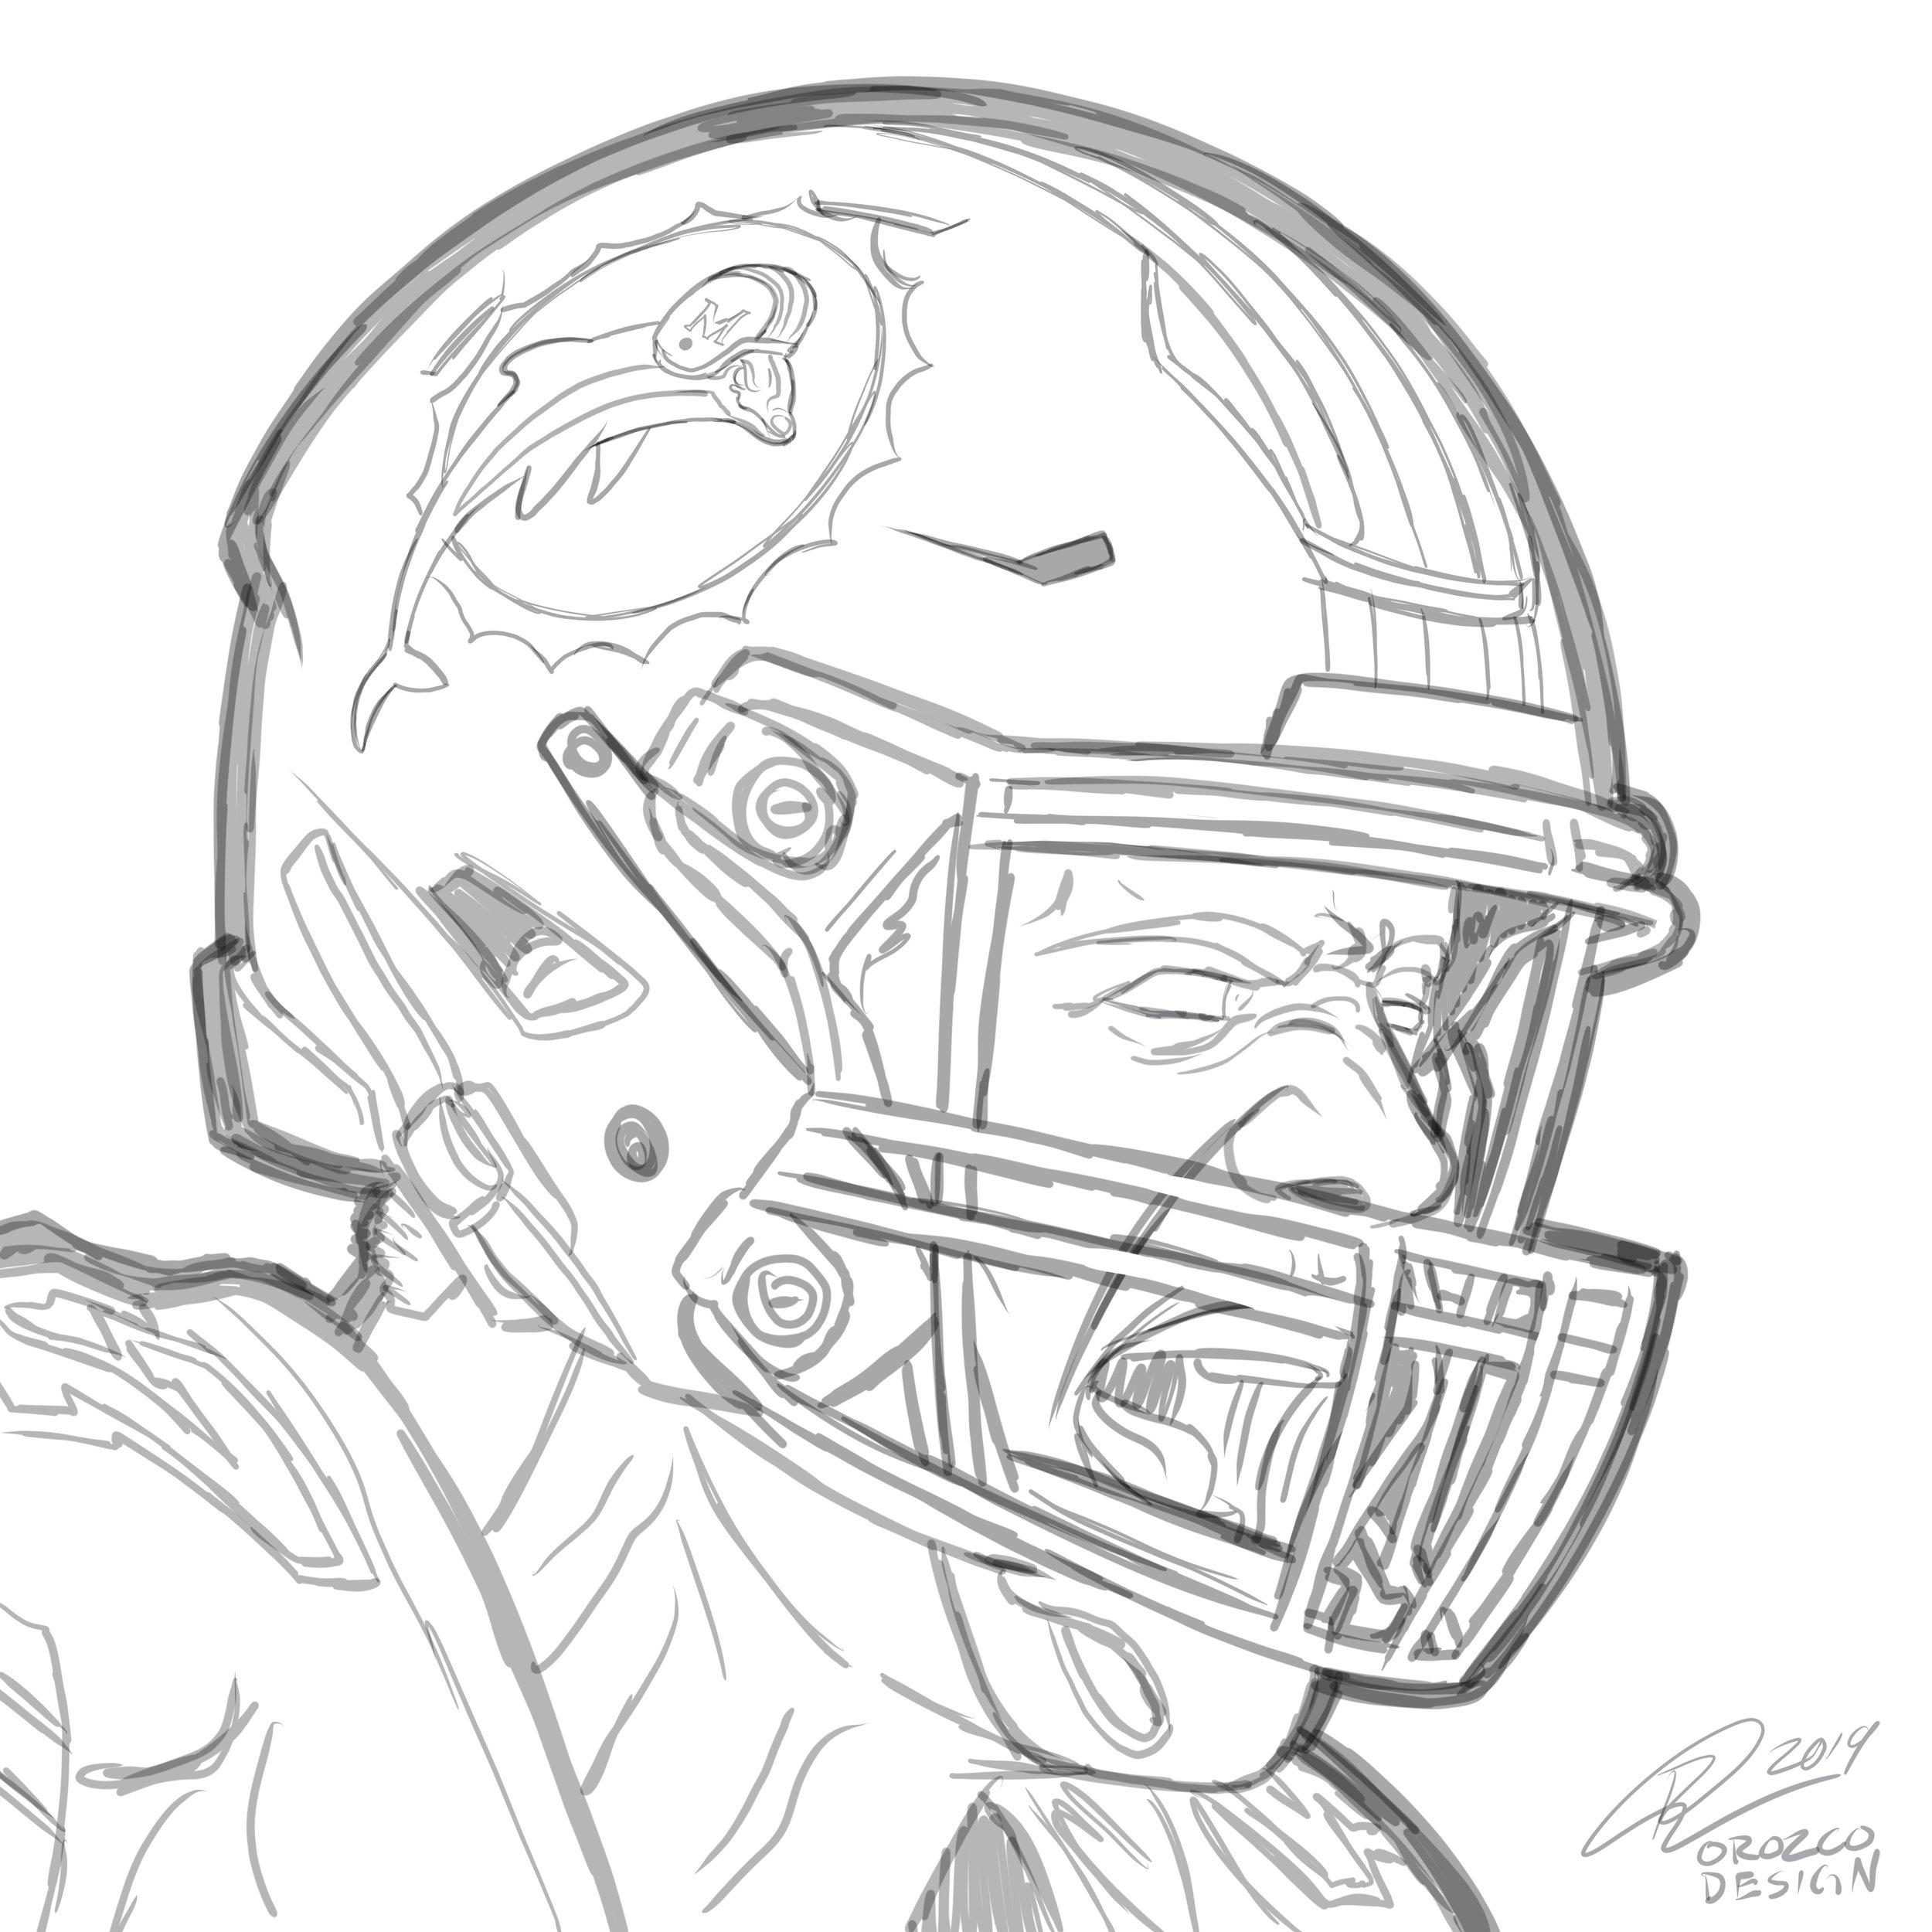 orozcodesign-miamidolphins-NFL-KikoAlonso-illustration-sketch .JPG